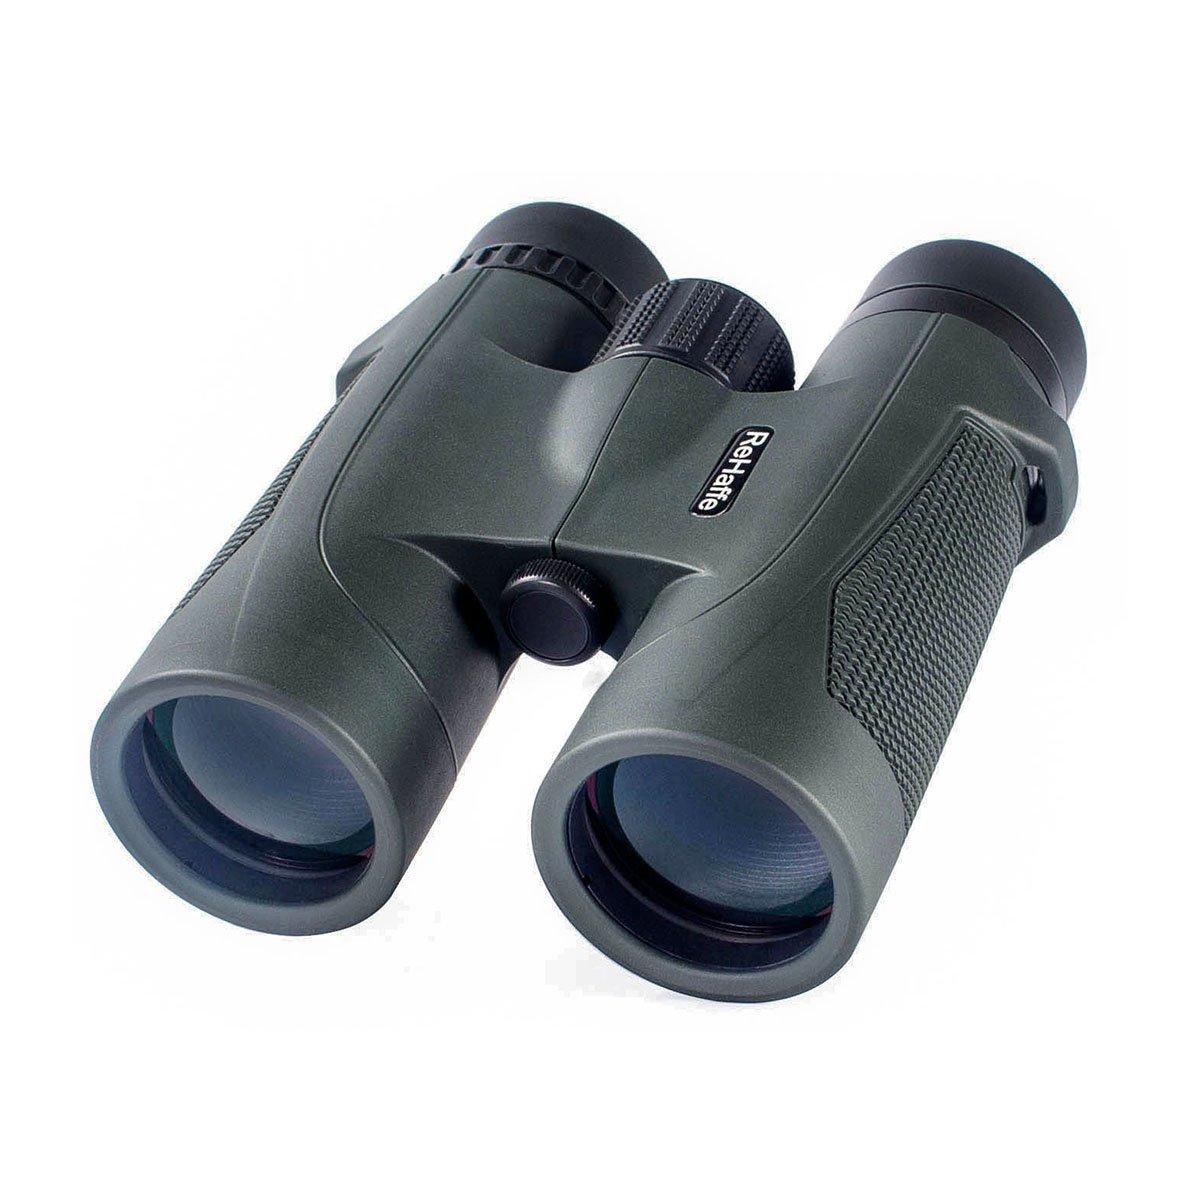 ReHaffe 8×42 Binoculars, Compact HD Binoculars for Adults, Professional Waterproof Binoculars for Bird Watching Wildlife Watching Travelling Sightseeing Hiking and Concert Army Green